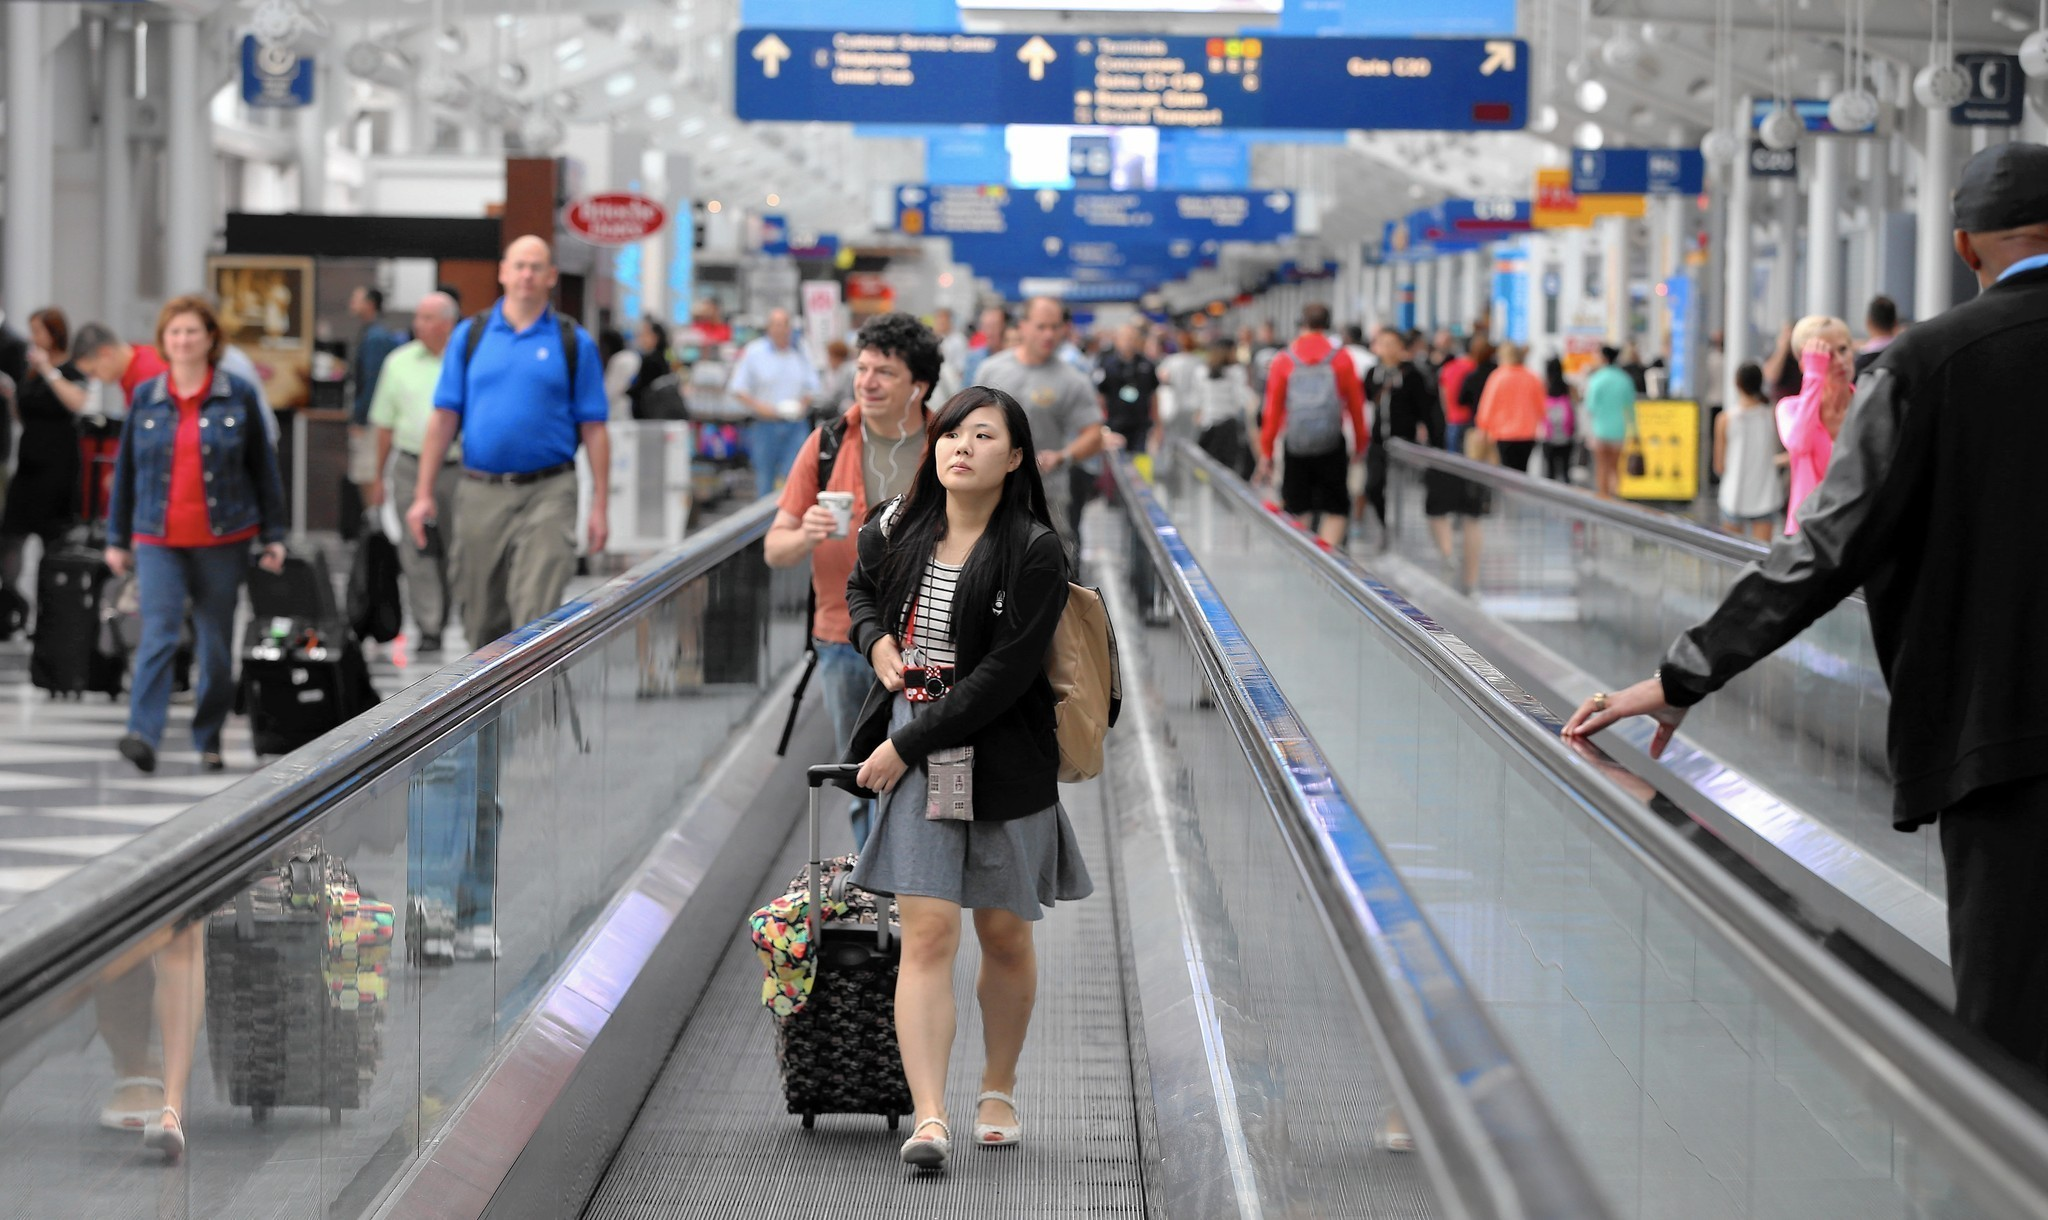 Megahub airports like O'Hare to dominate in the future ...